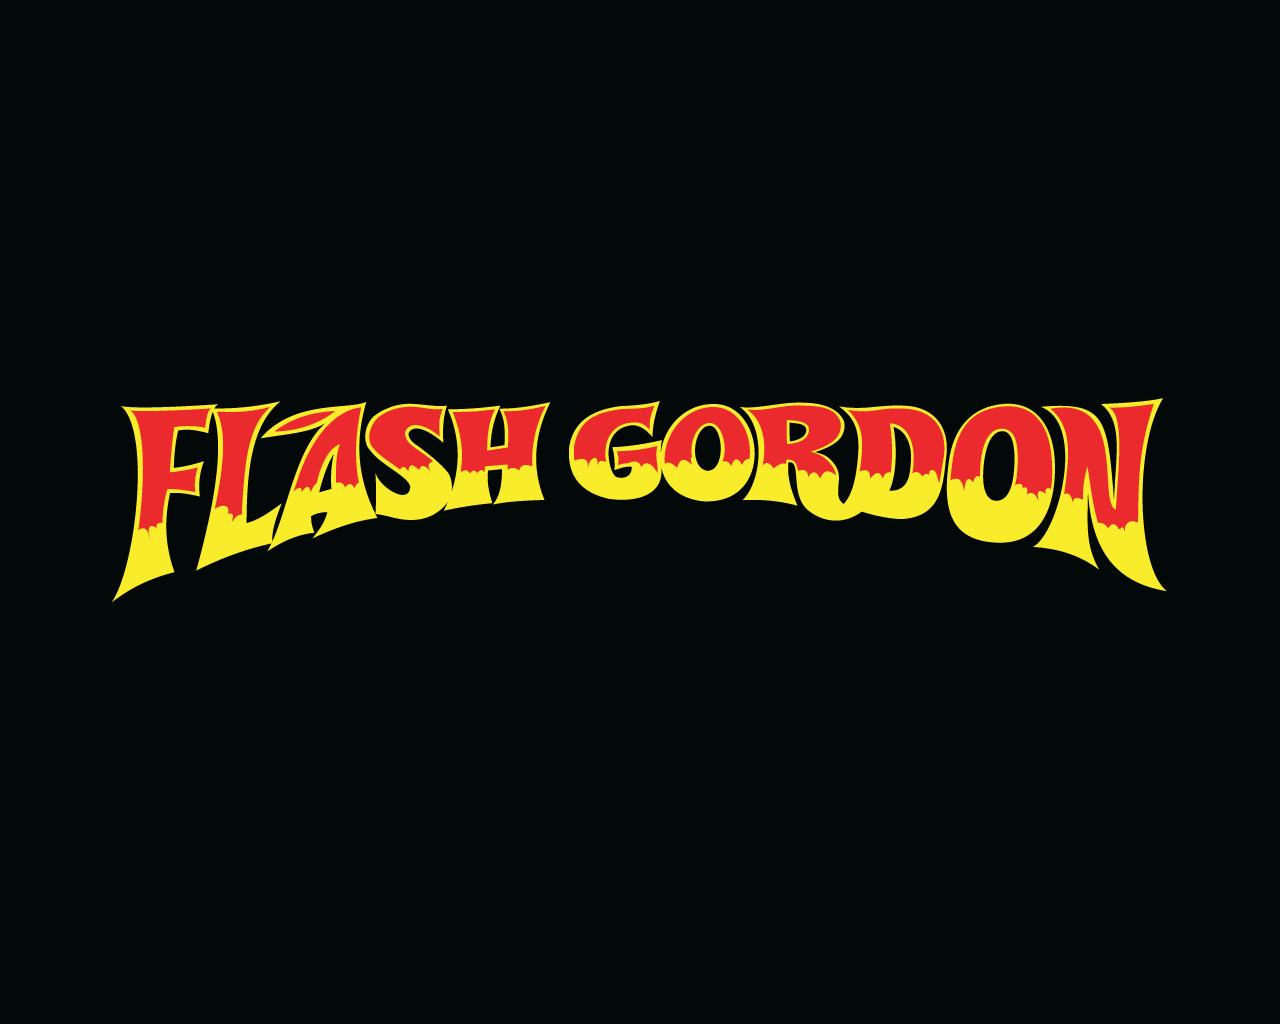 Flash Gordon Wallpaper by www10thwaycouk Desktop and mobile 1280x1024